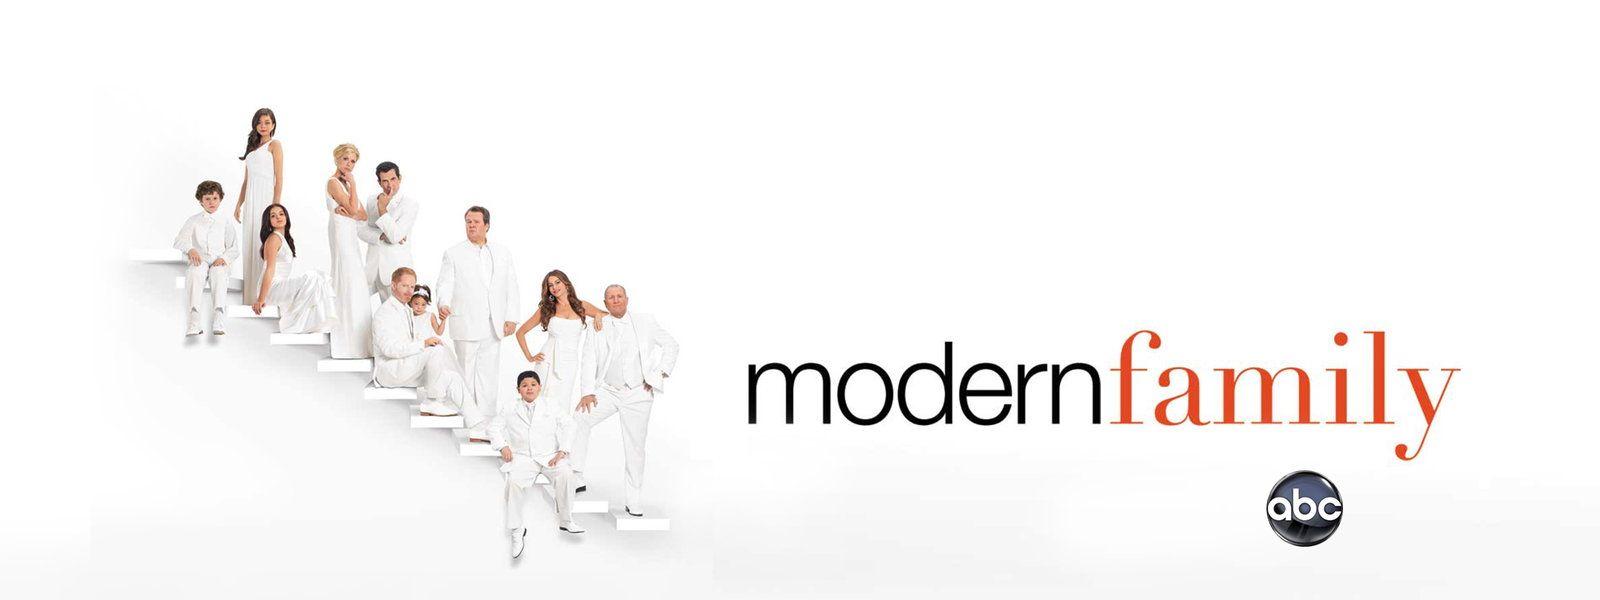 Watch Modern Family Online Hulu Plus Modern Family Family Tv Series Family Tv